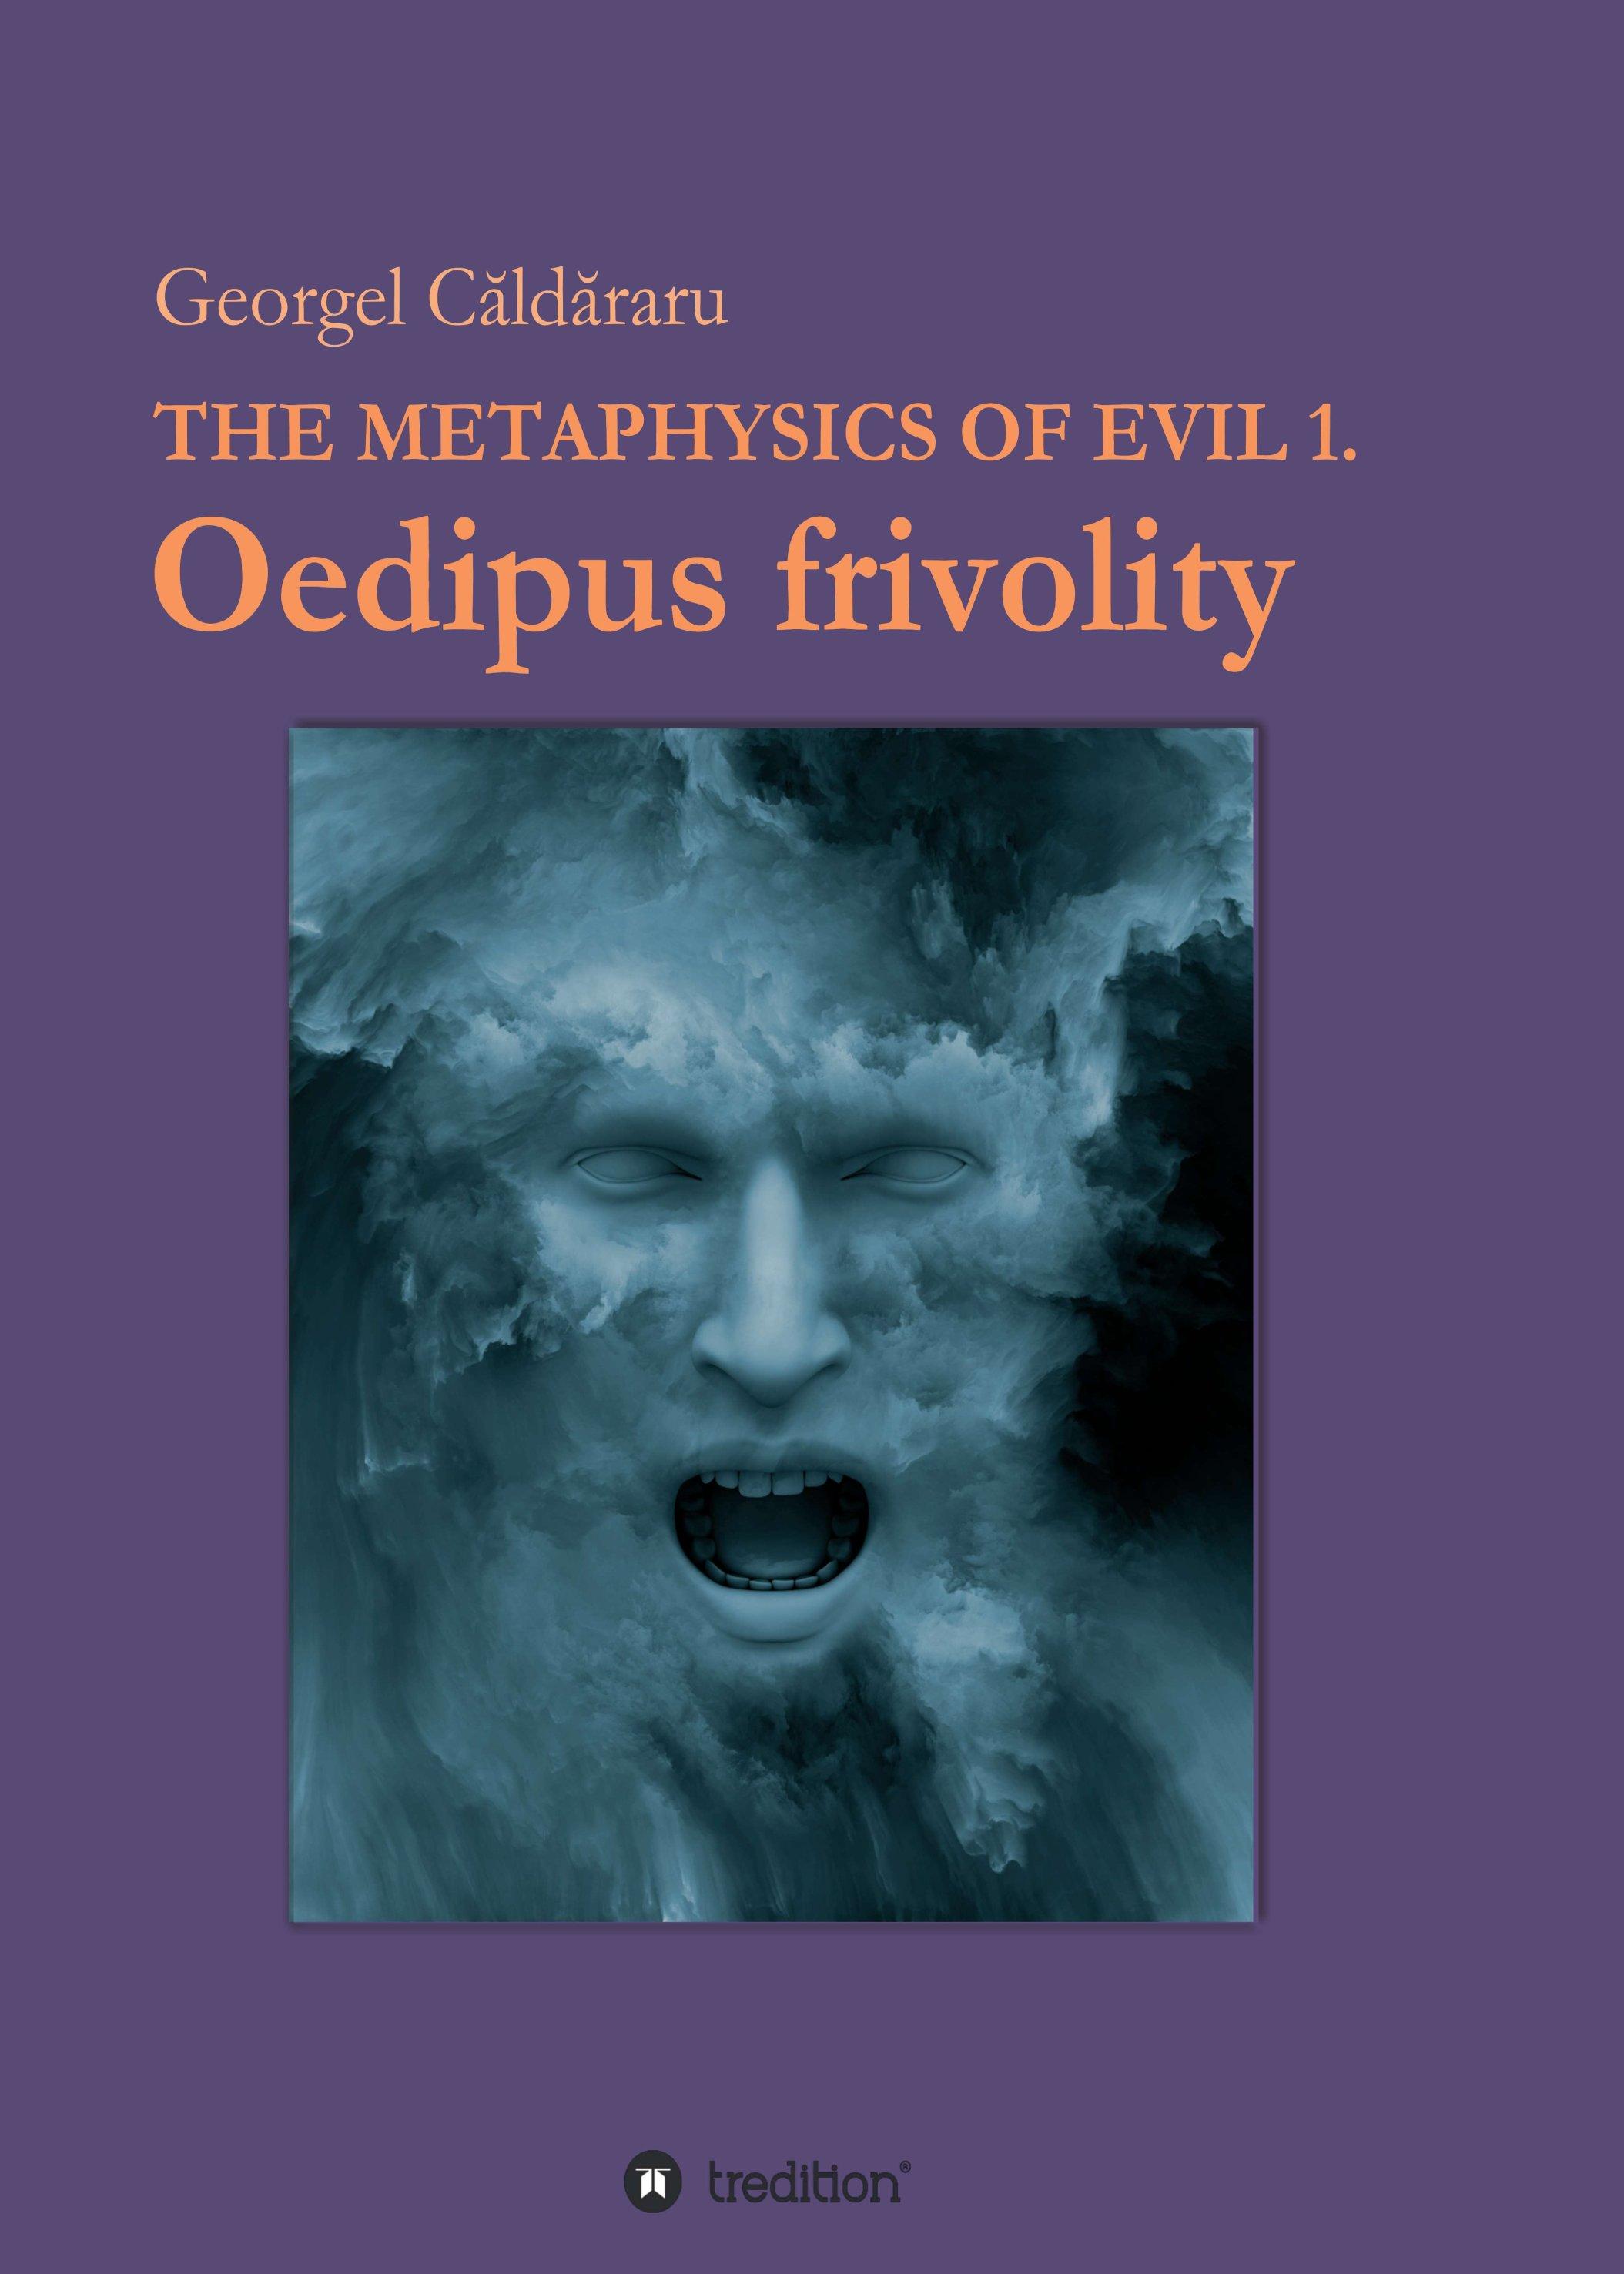 Oedipus frivolity - The Metaphysics of Evil